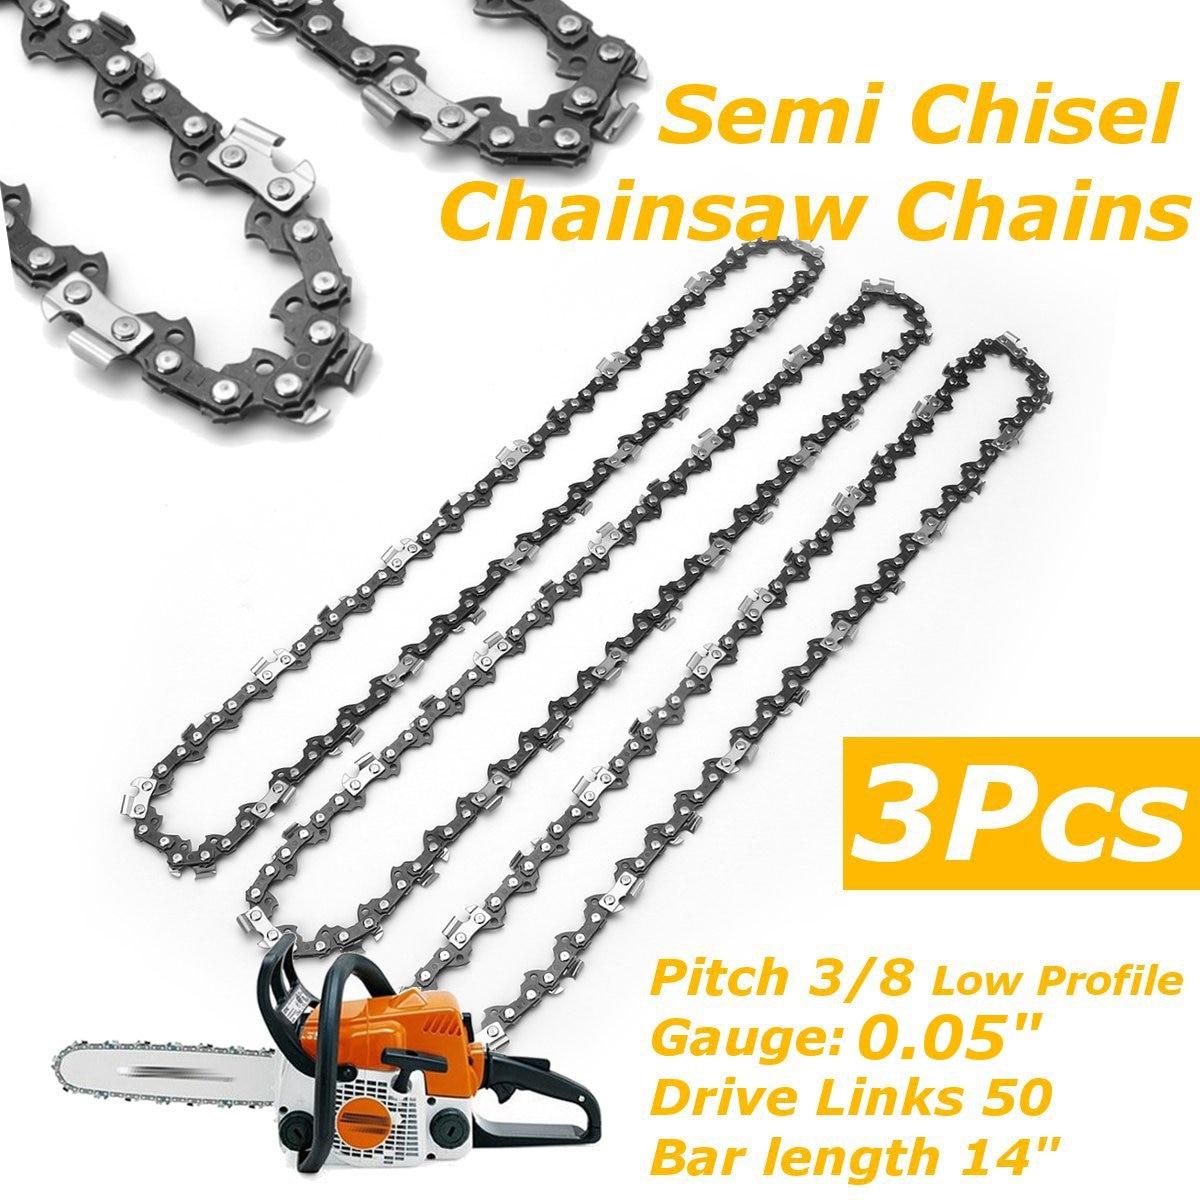 3Pcs Correntes de Motosserra Semi Cinzel 3/8LP 0.05 Para Stihl MS170 MS171 MS180 MS181 Serra Elétrica